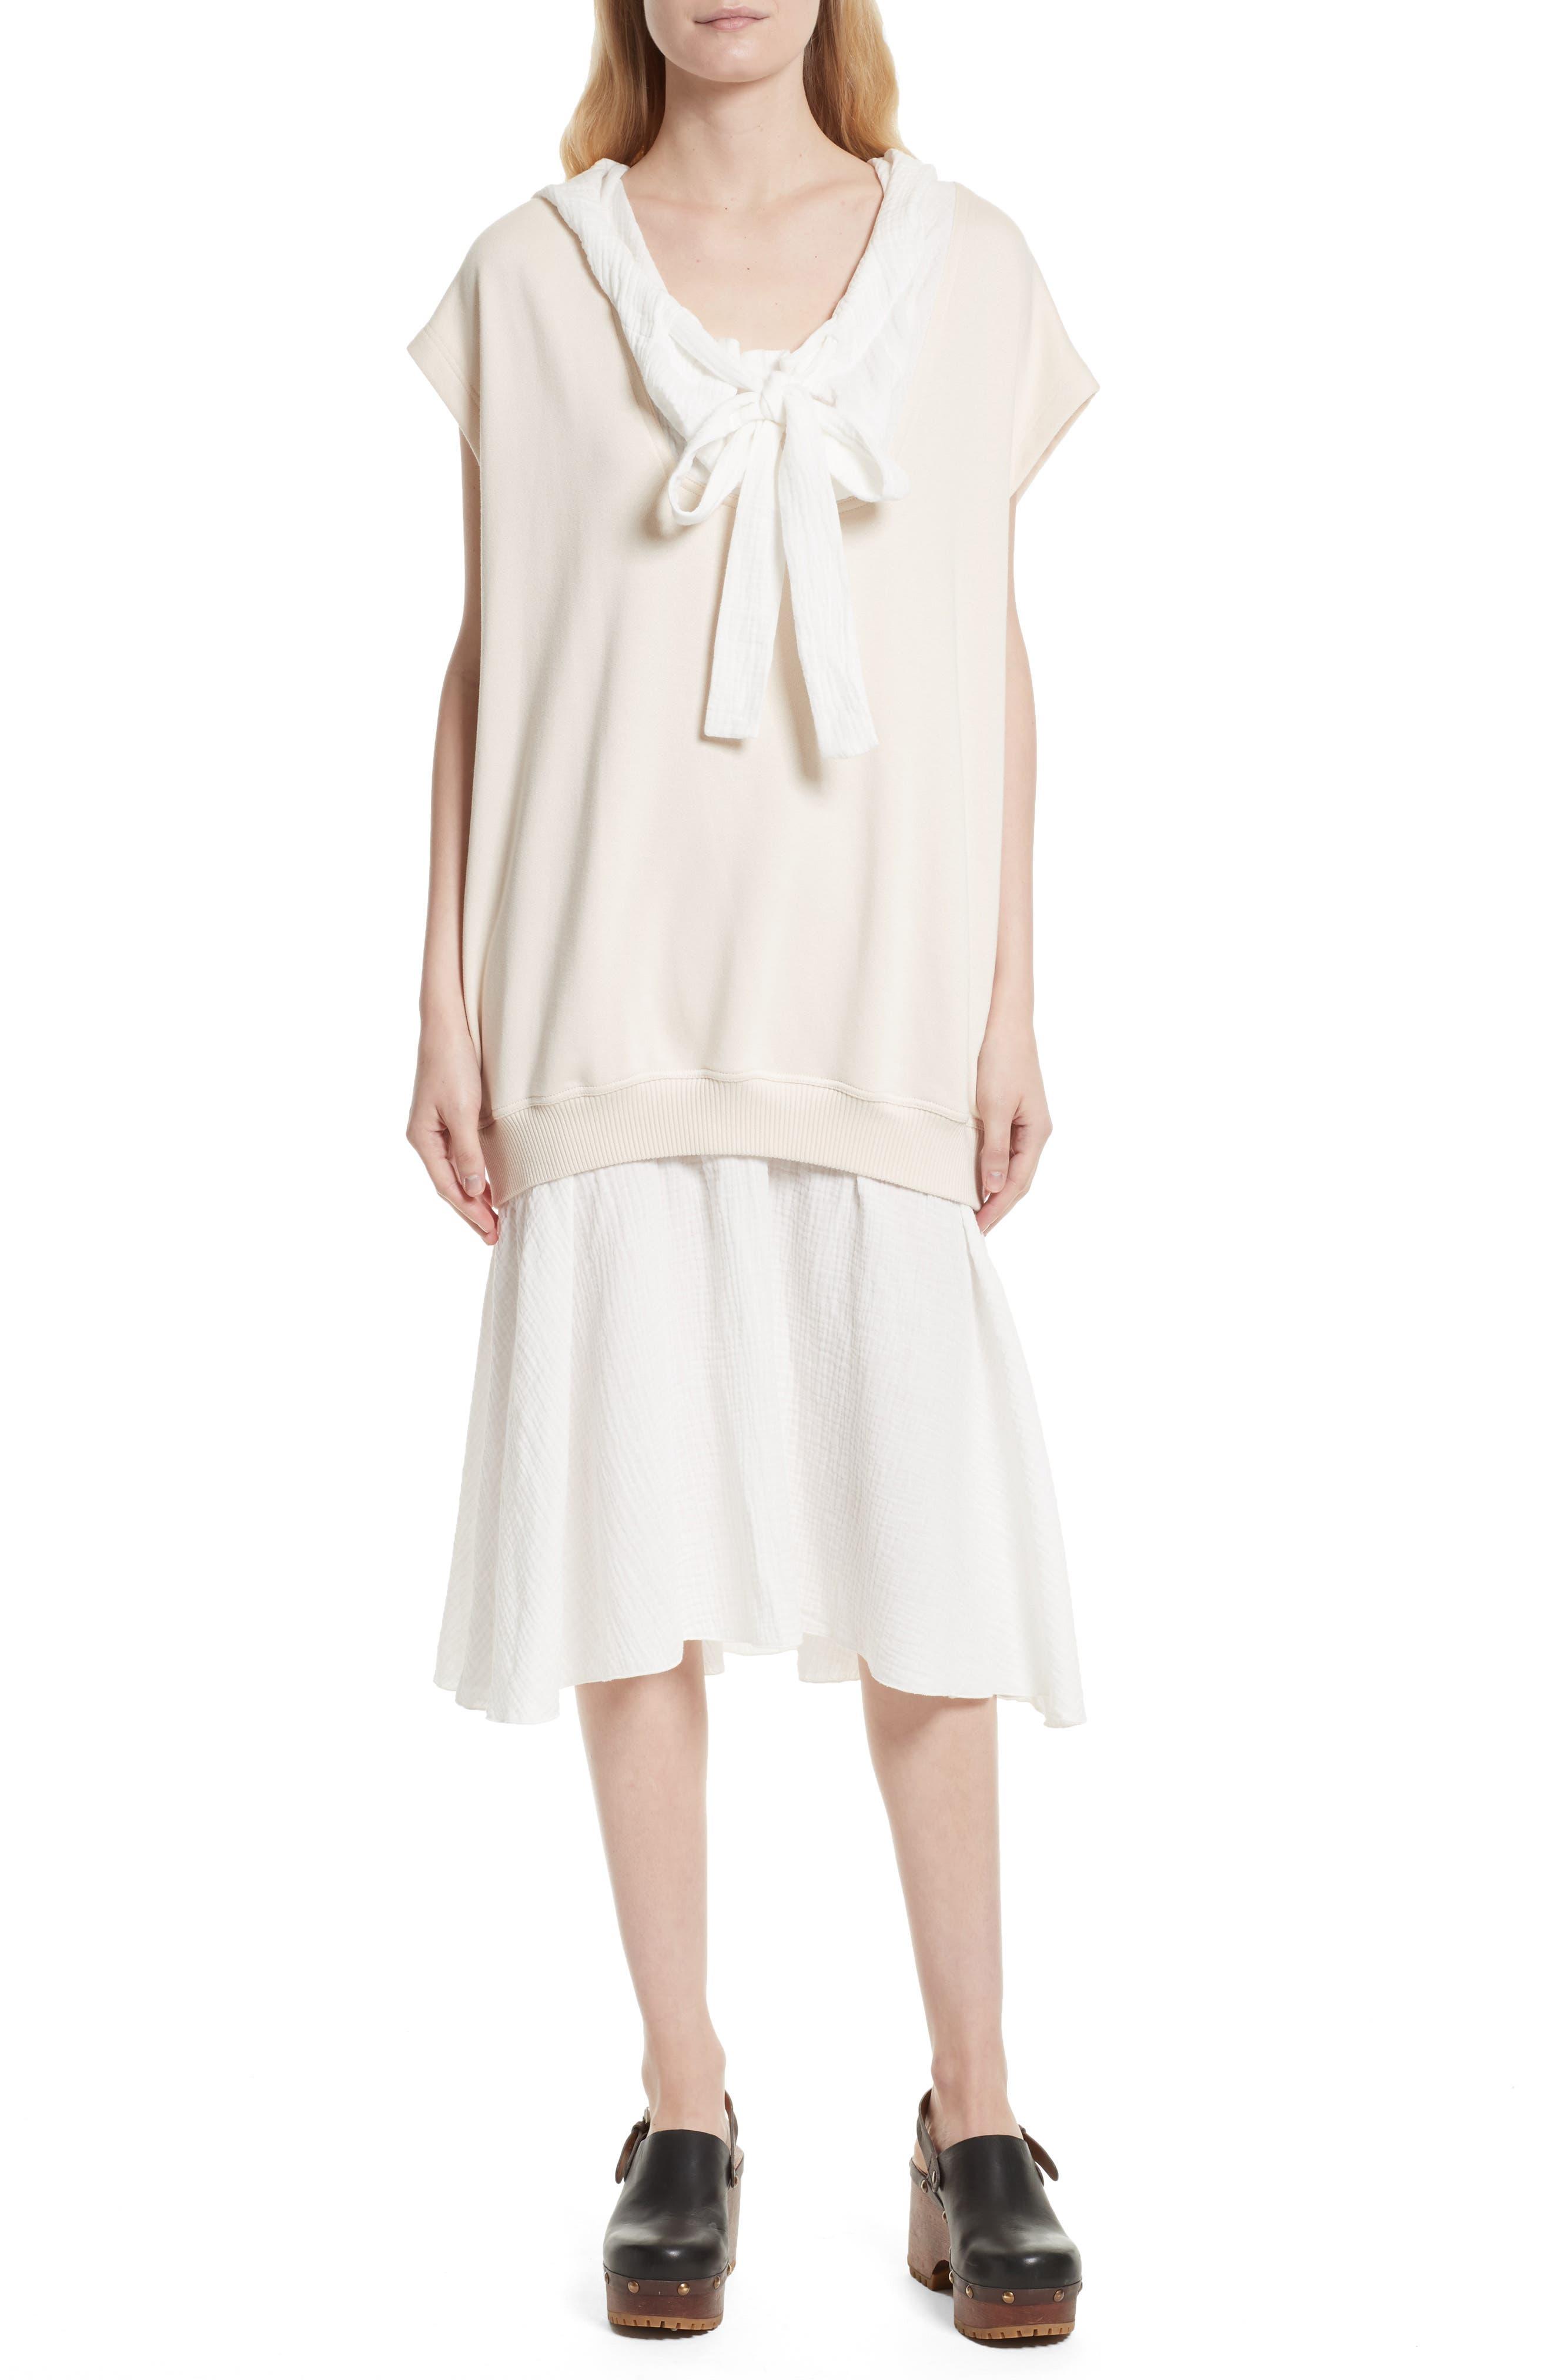 Hooded Sweatshirt Overlay Dress,                             Main thumbnail 1, color,                             170